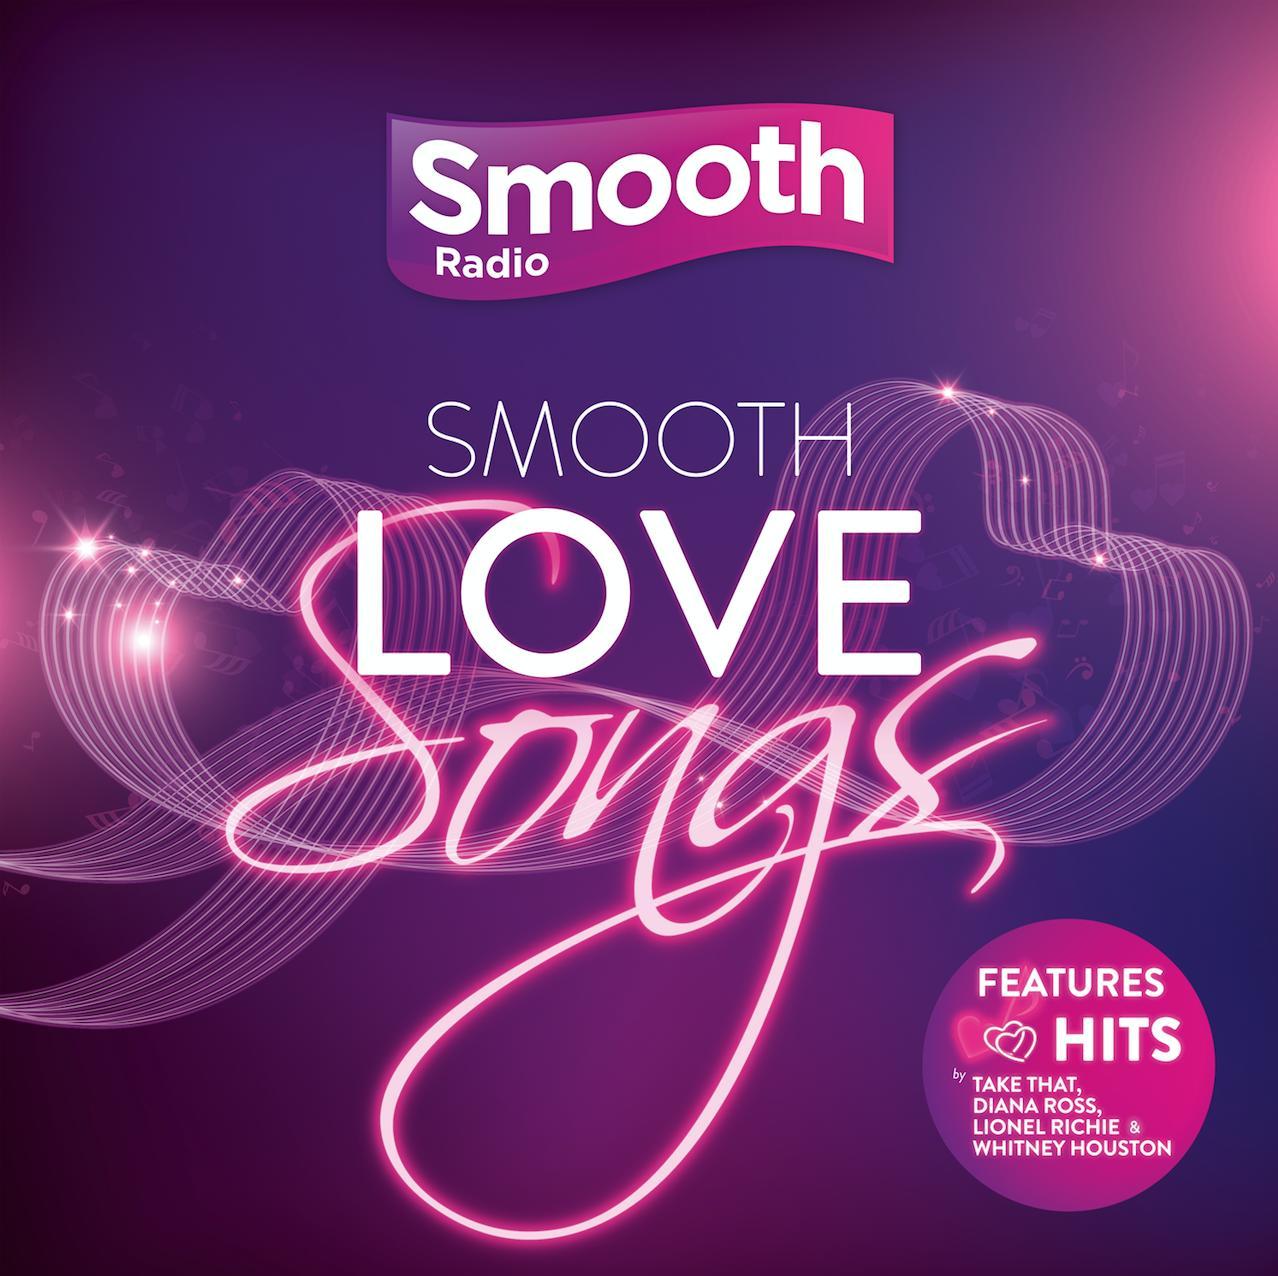 Smooth Radio new album